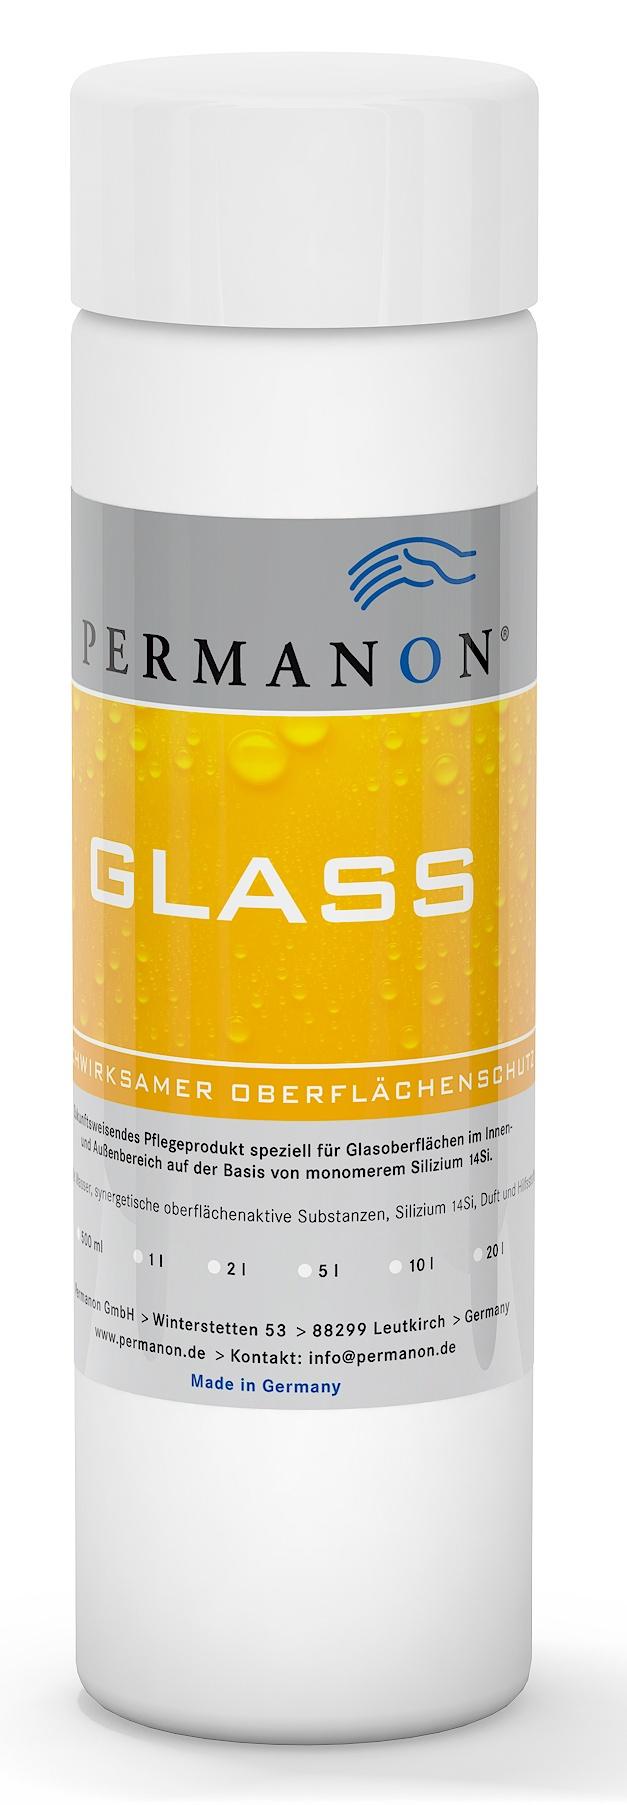 glass-permanon.jpg